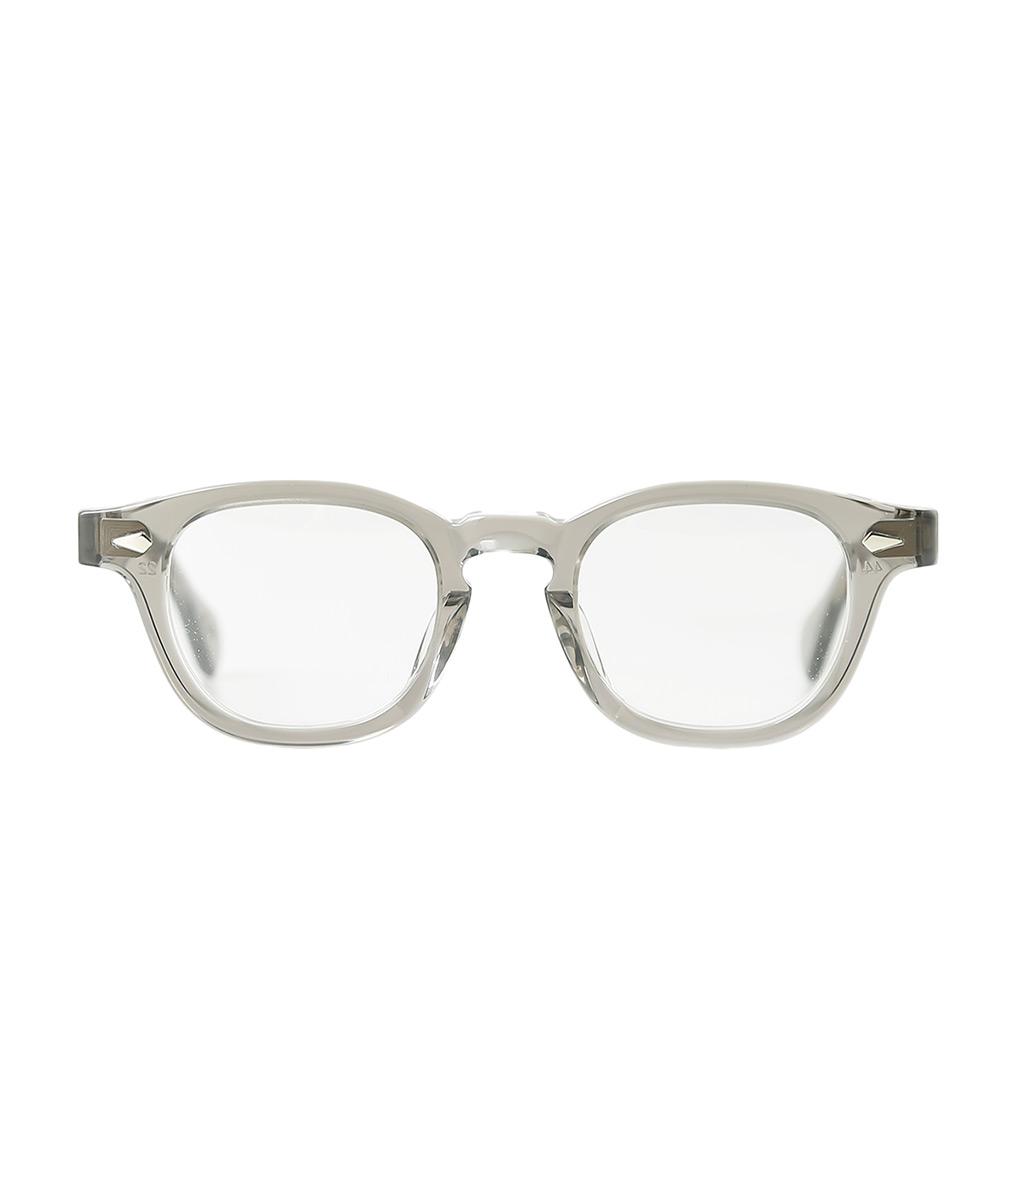 JULIUS TART OPTICAL / ジュリアスタートオプティカル : AR 44-22 - GREY CRYSTAL / CLEAR - : メガネ 眼鏡 アイウェア : JTPL-001L-wise 【WIS】